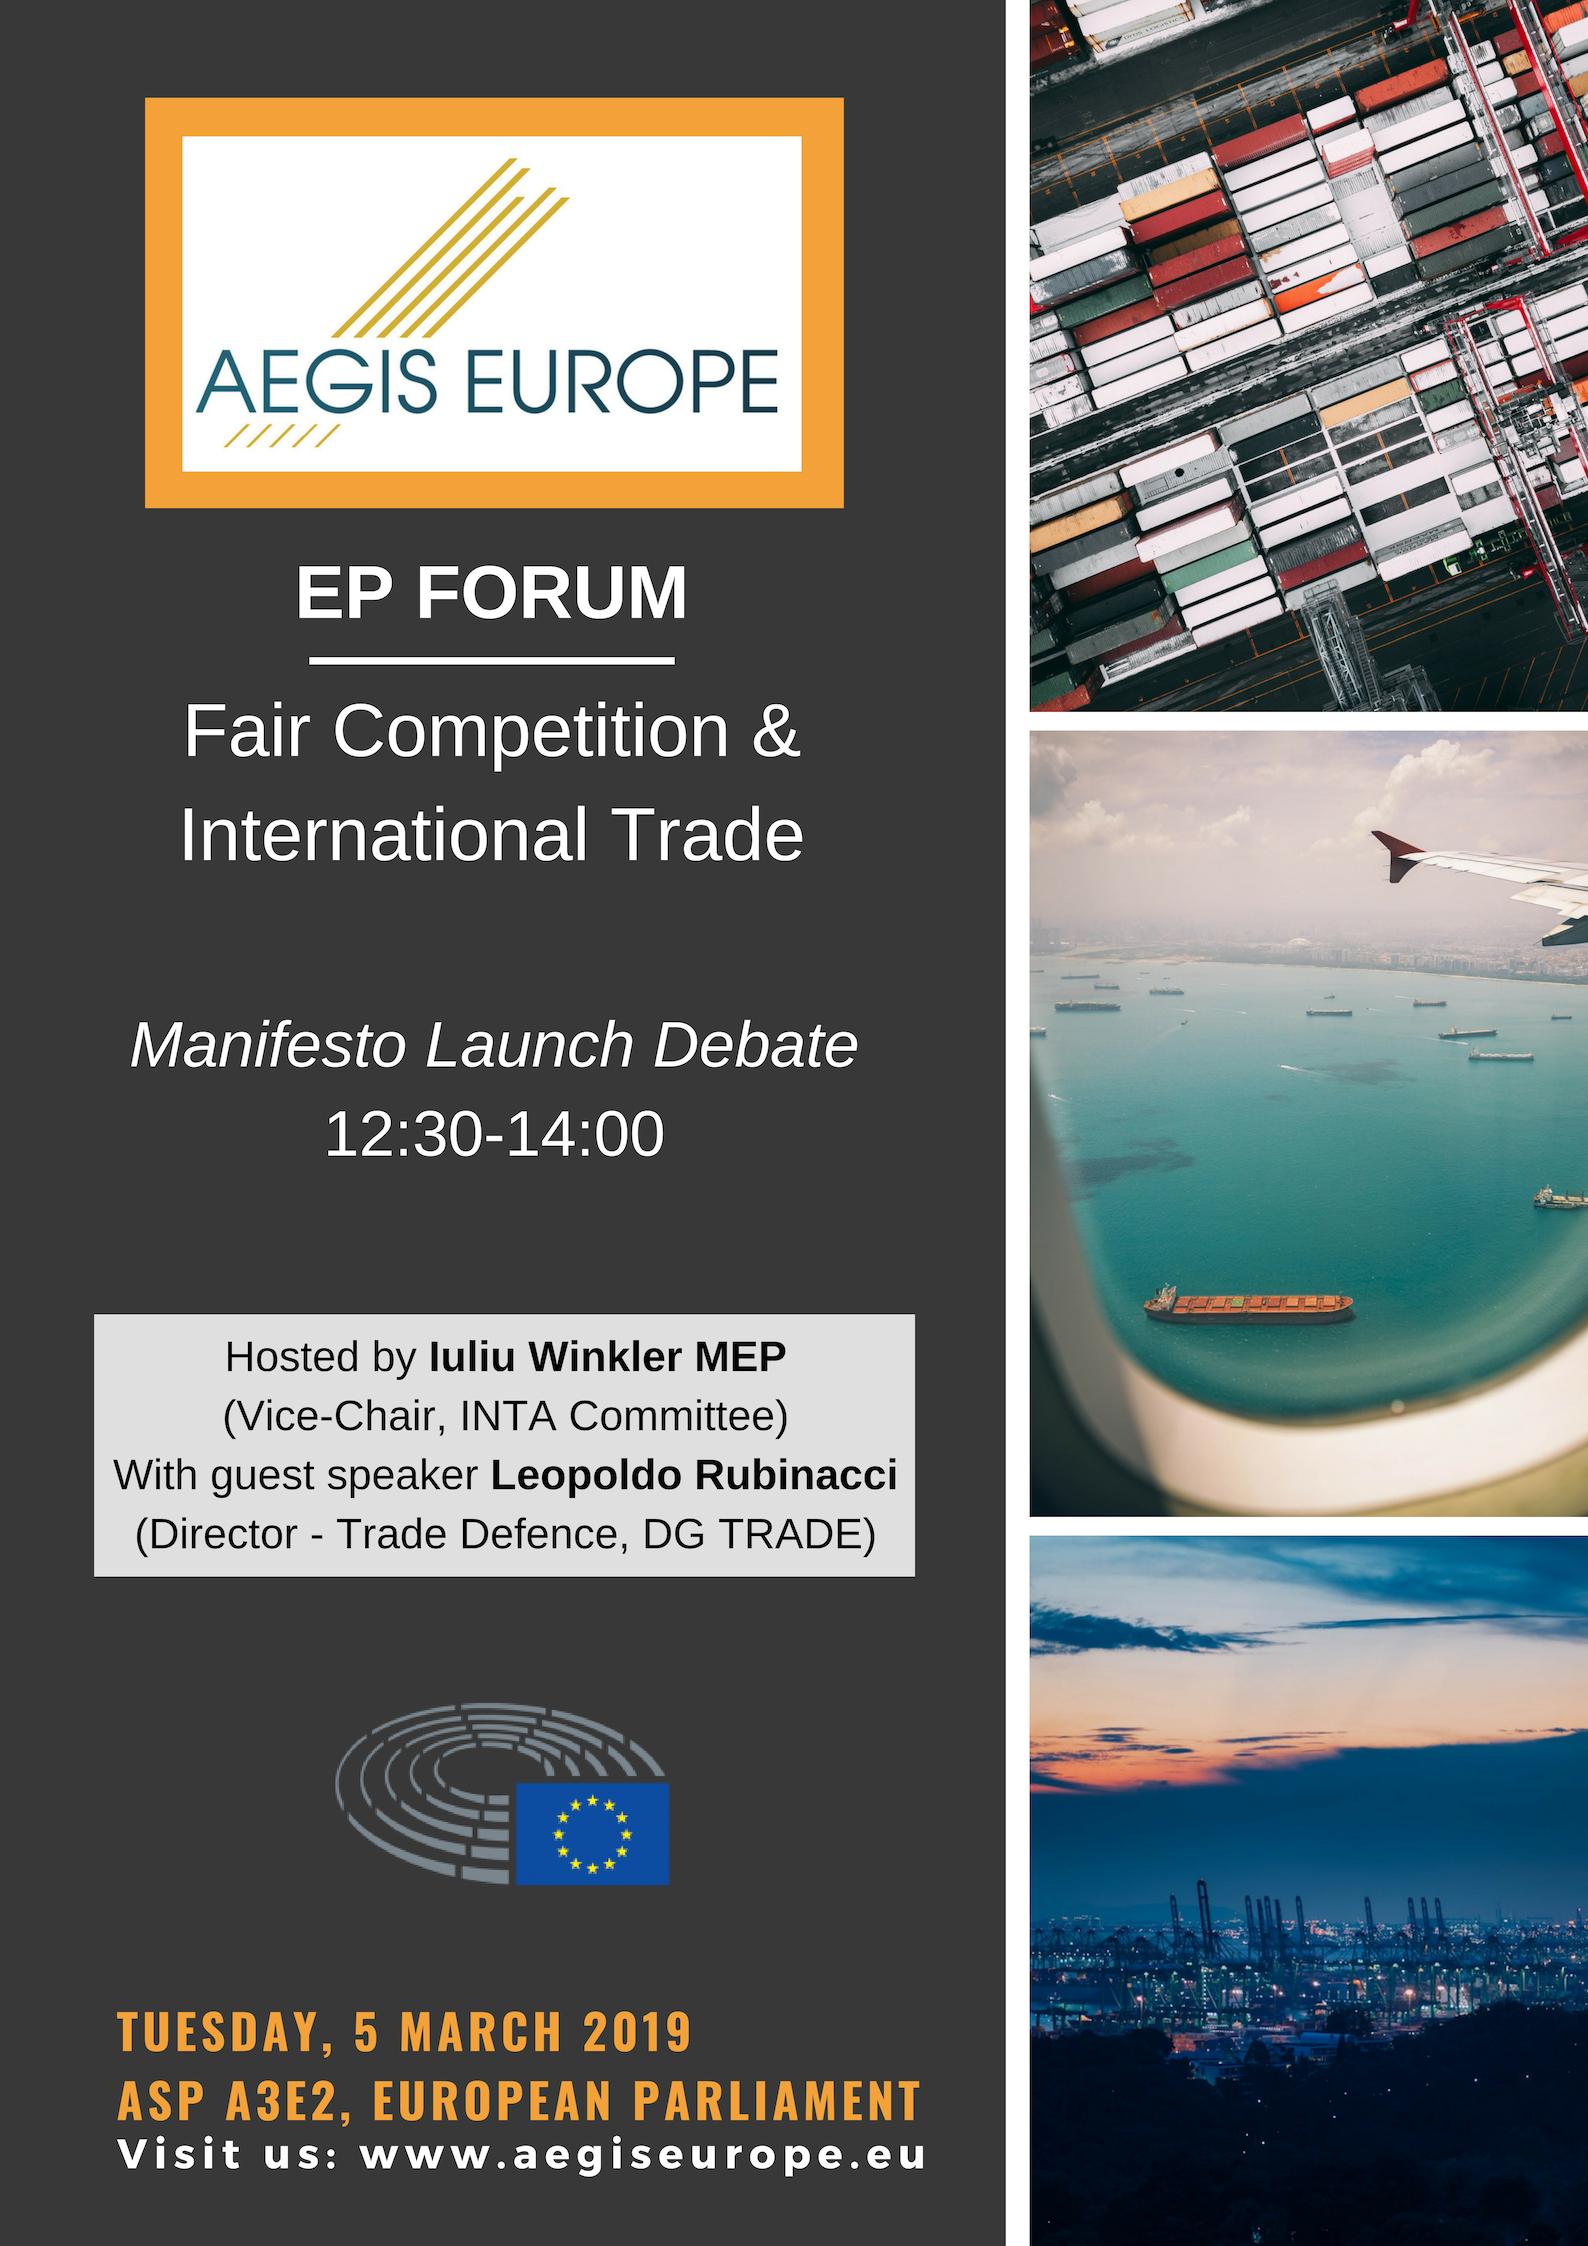 AEGIS EUROPE EP Forum - Poster 1.png